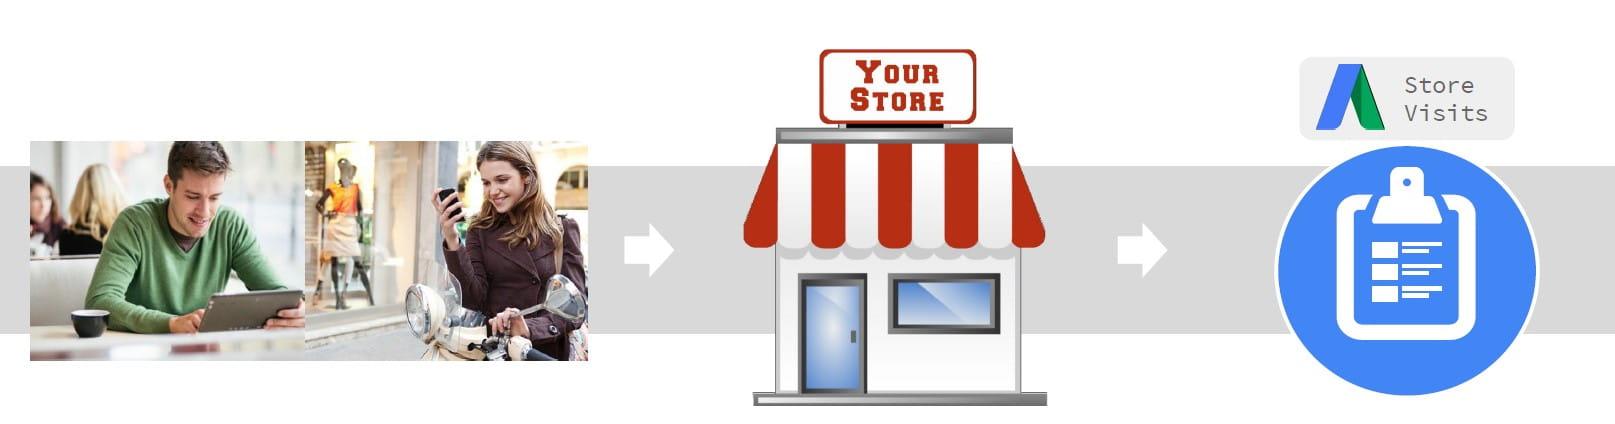 Store Visits Google